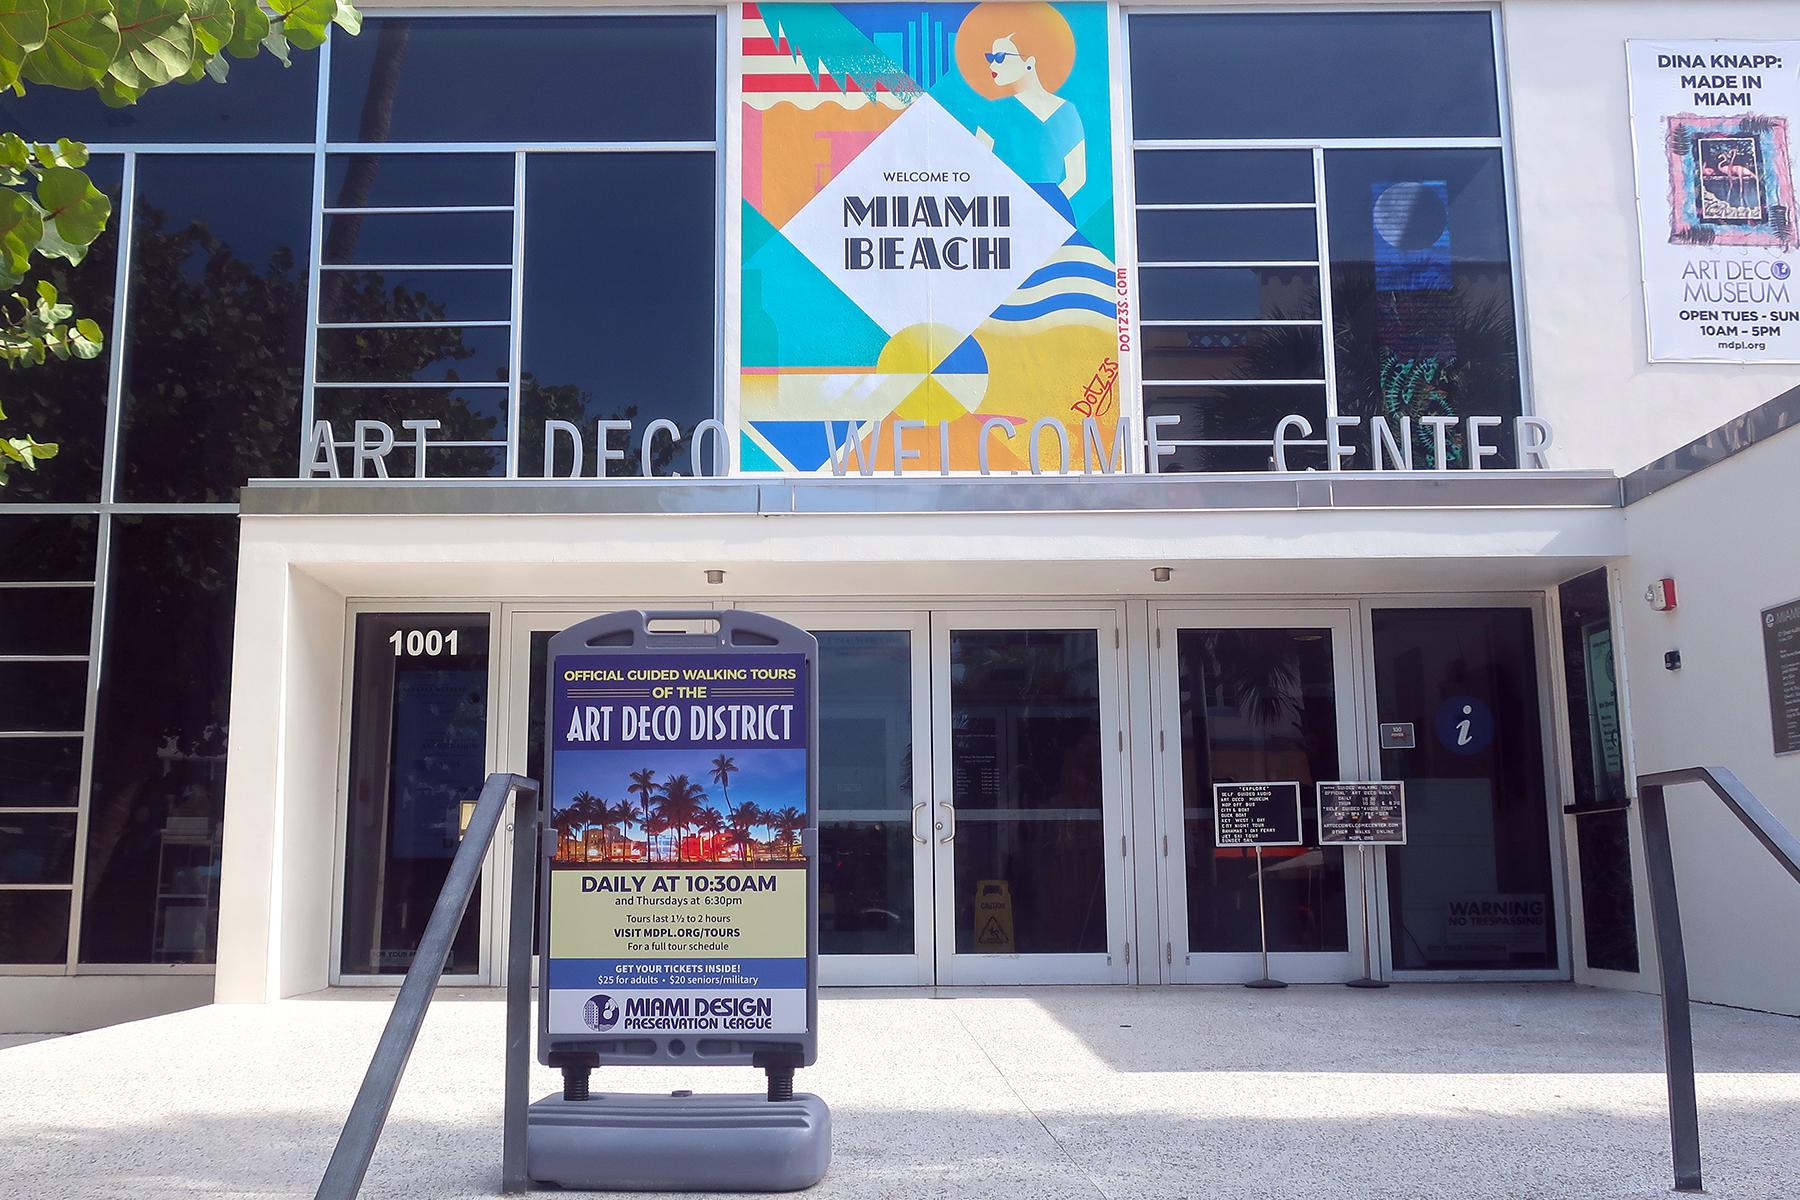 Sonne, Strand, South Beach: 13 Insidertipps für Miami Beach